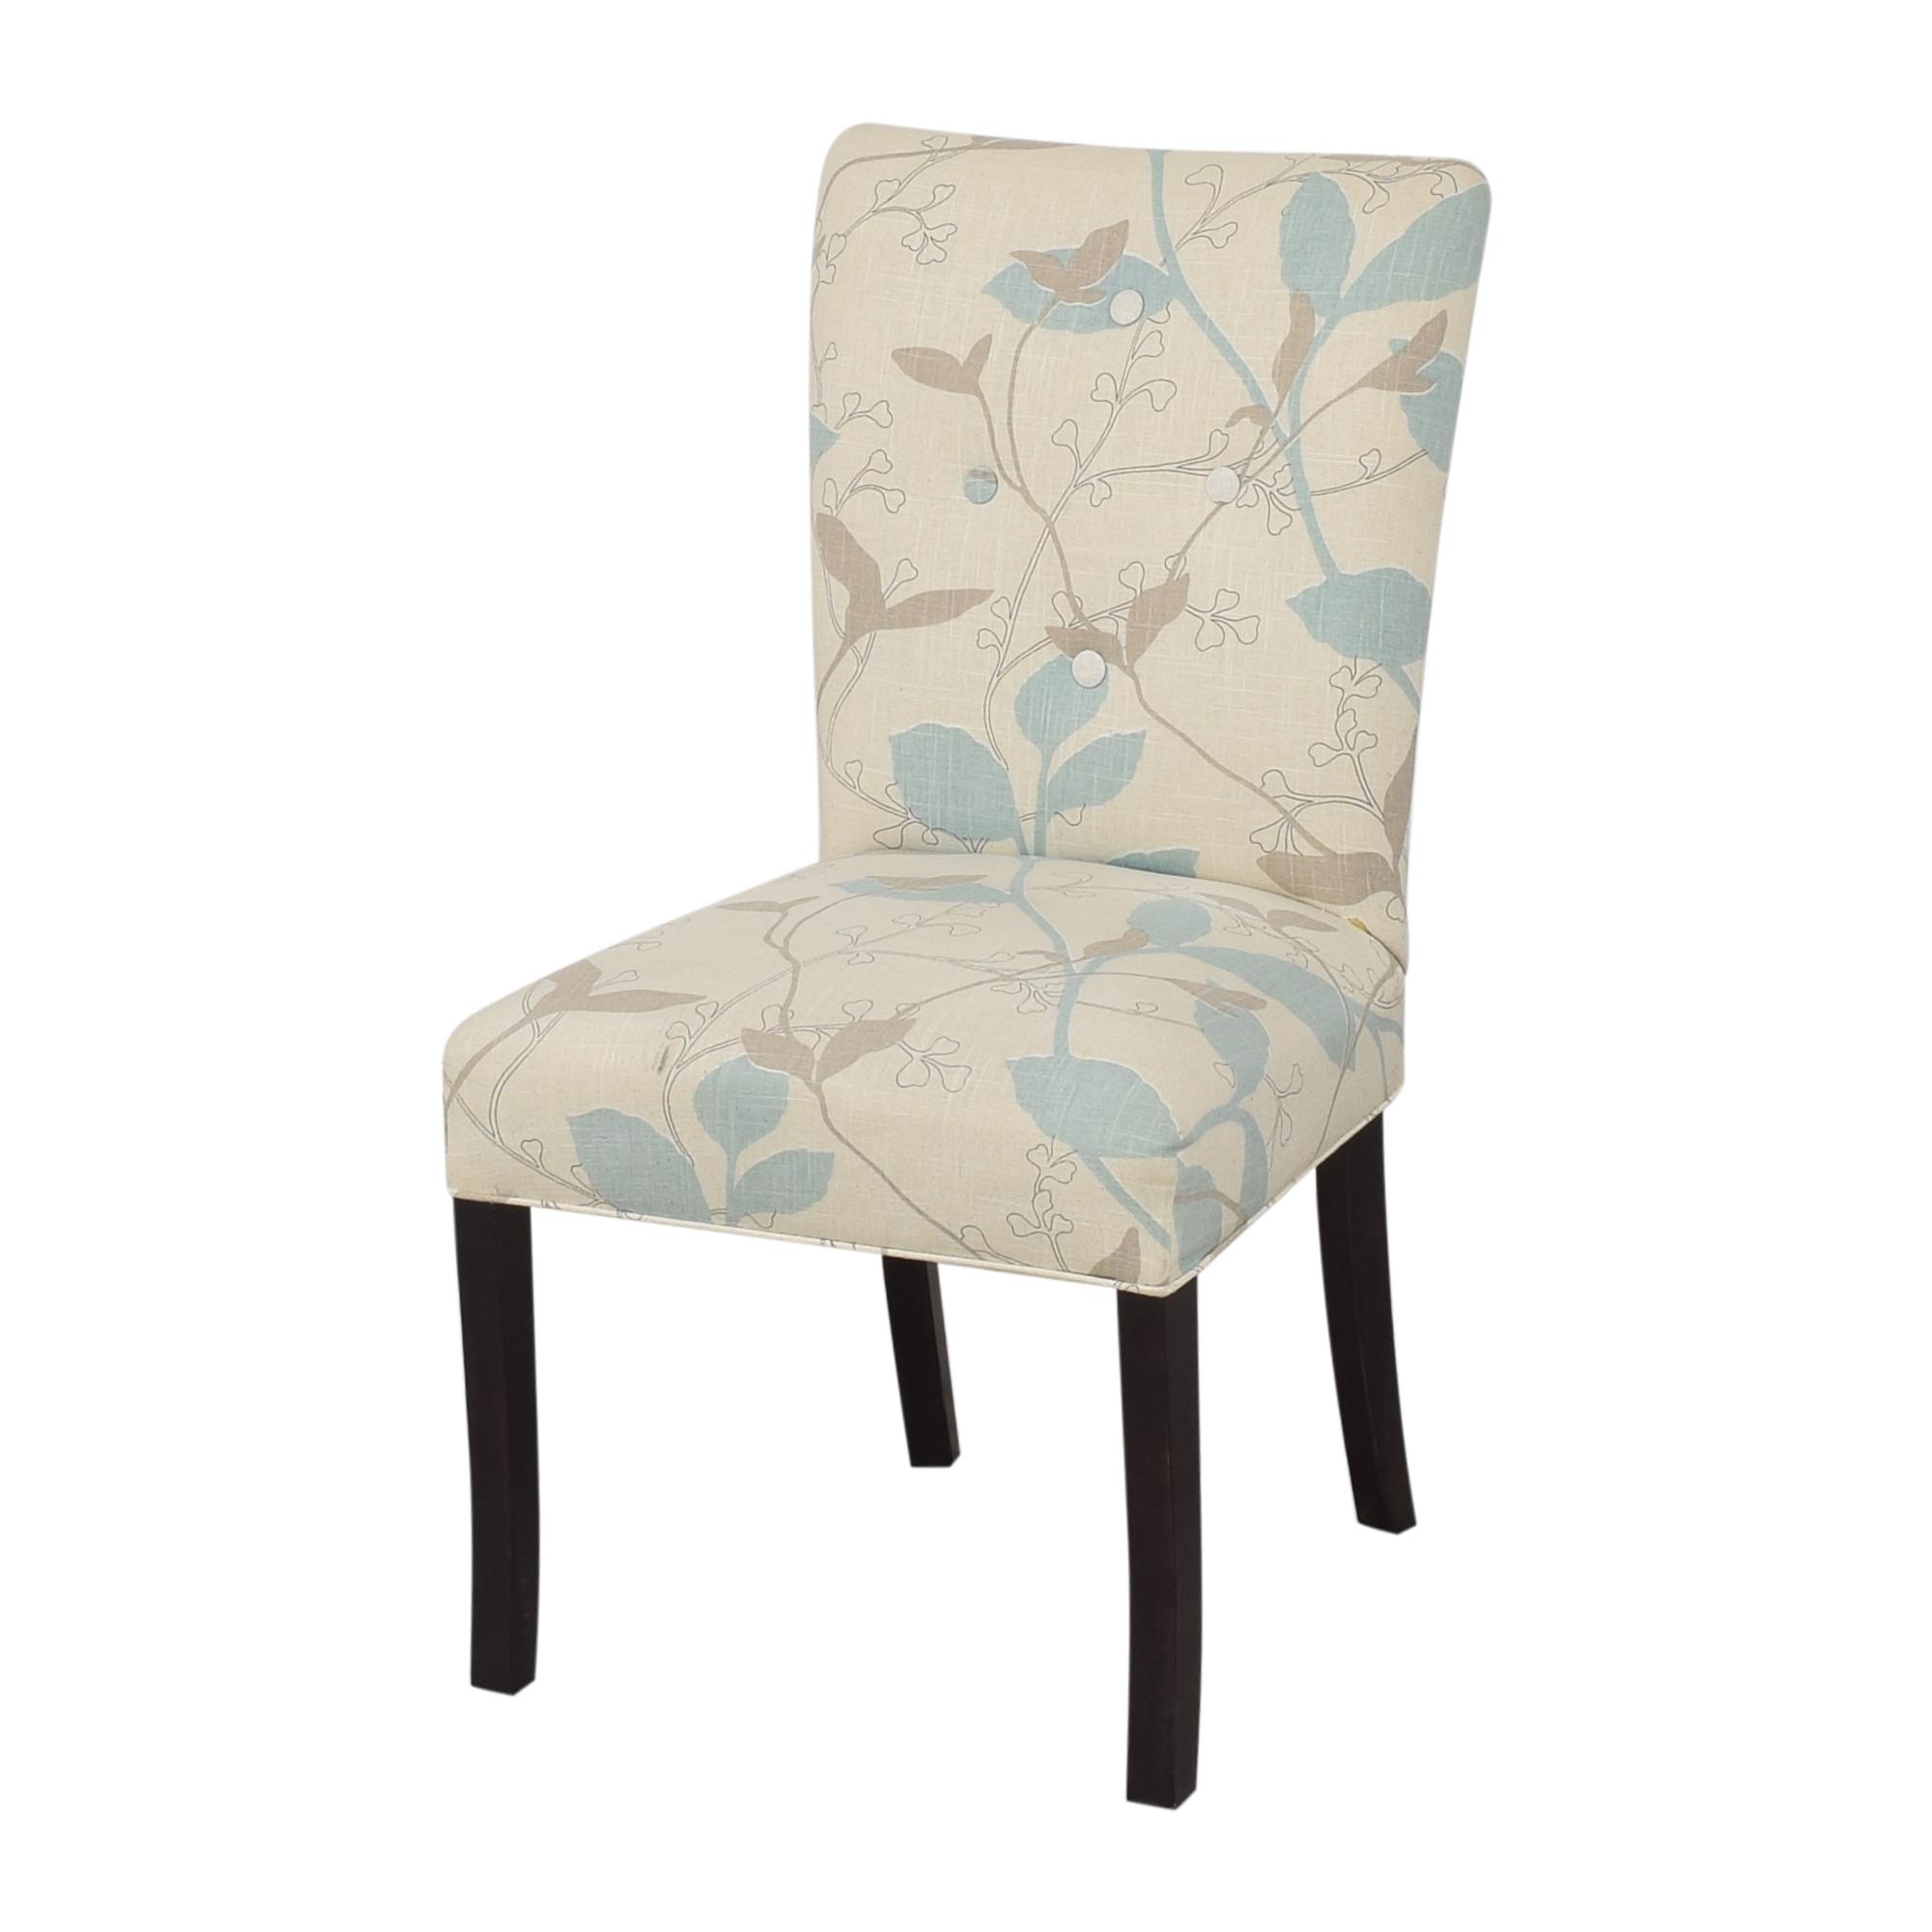 buy Wayfair Wayfair Sole Designs Upholstered Dining Chairs online